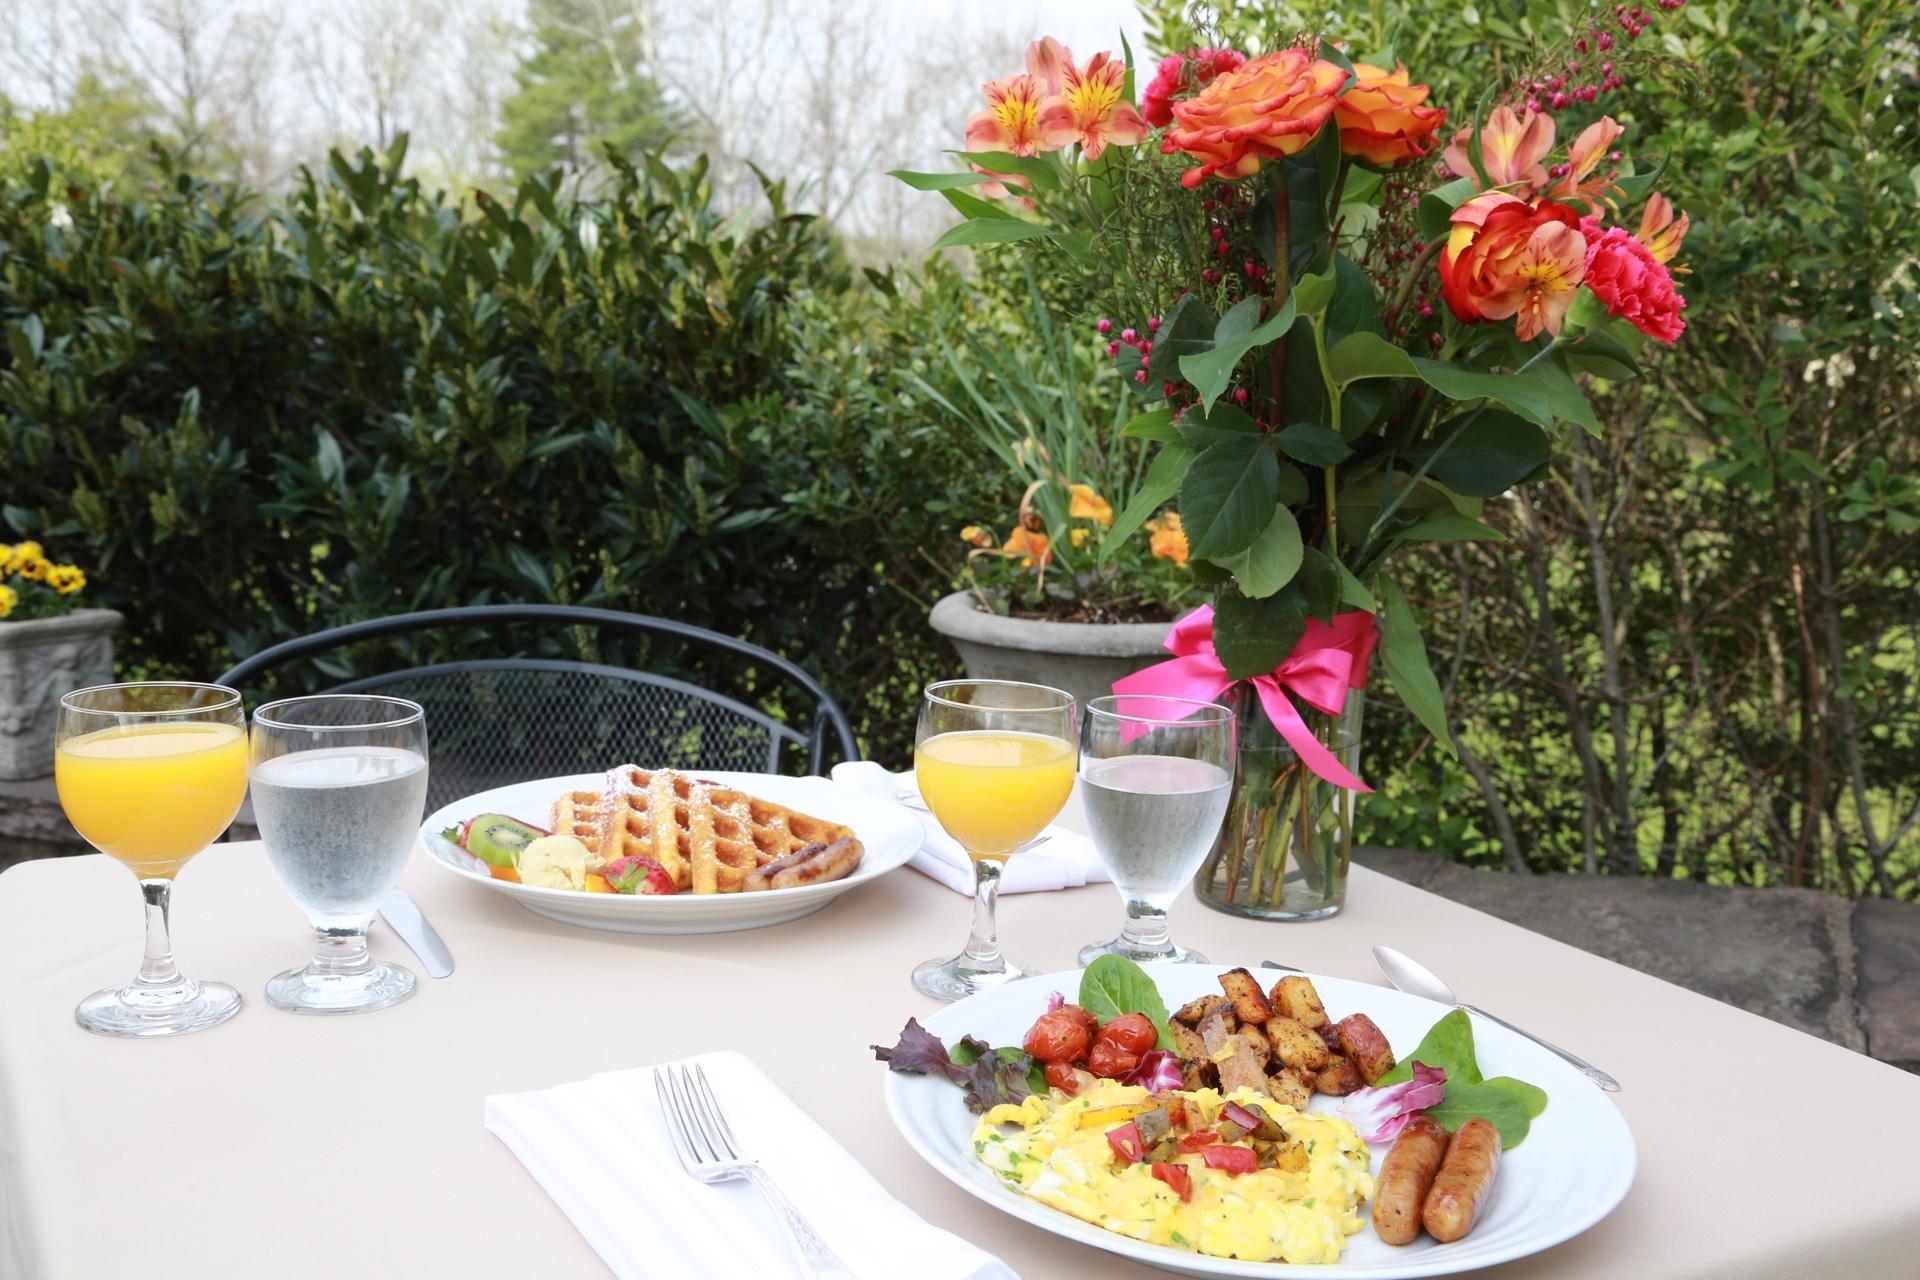 Breakfast on the Patio